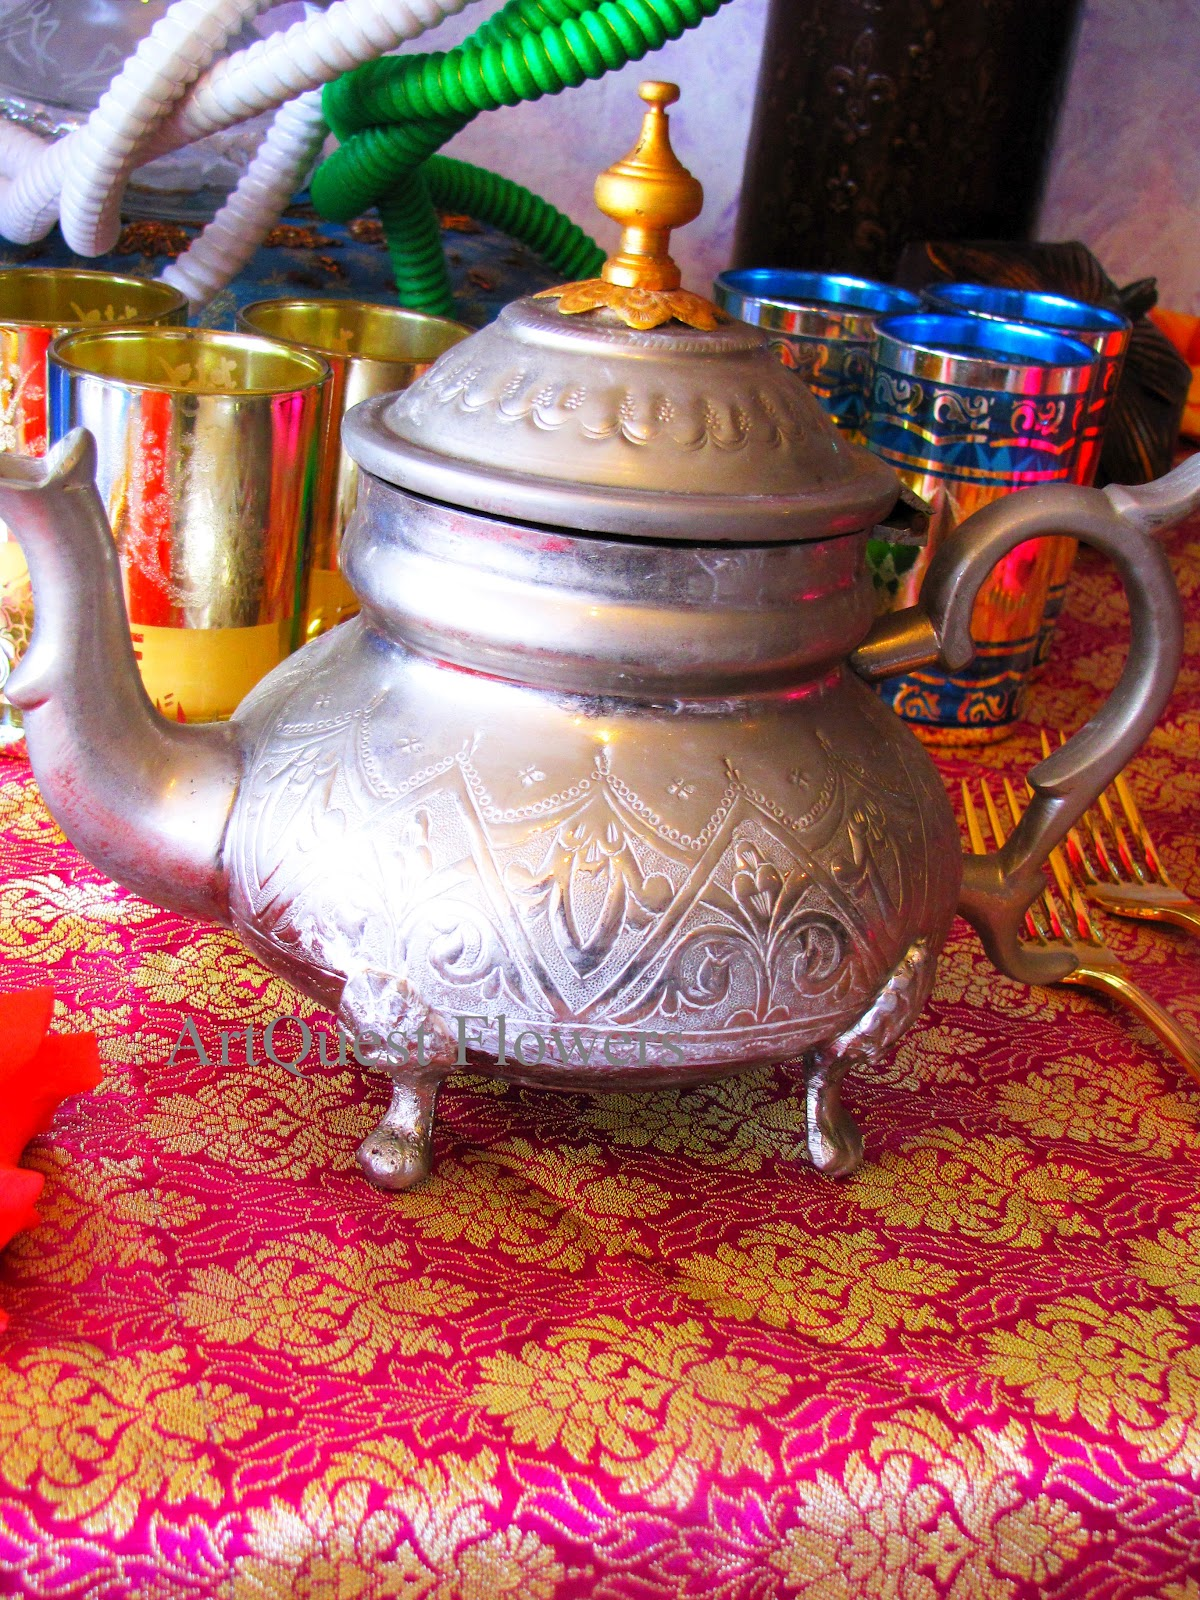 7_Moroccan Teapot.JPG